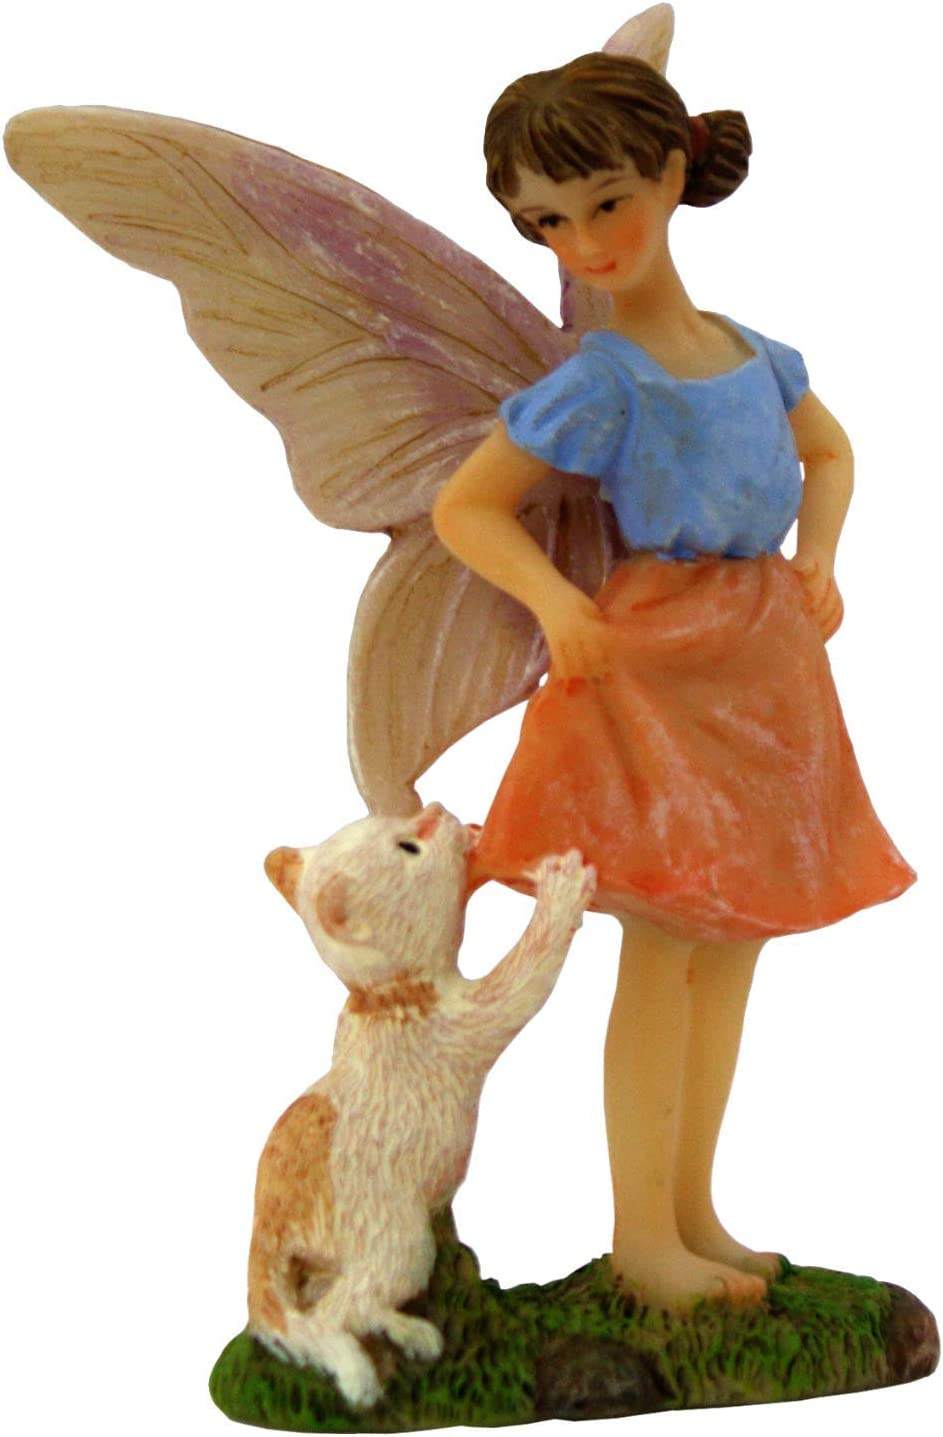 PRETMANNS Fairy Garden Fairies Accessories – Outdoor Fairy Figurine for Miniature Garden – Standing Fairy Ava with Cat – Fairy Garden Supplies - 1 Piece